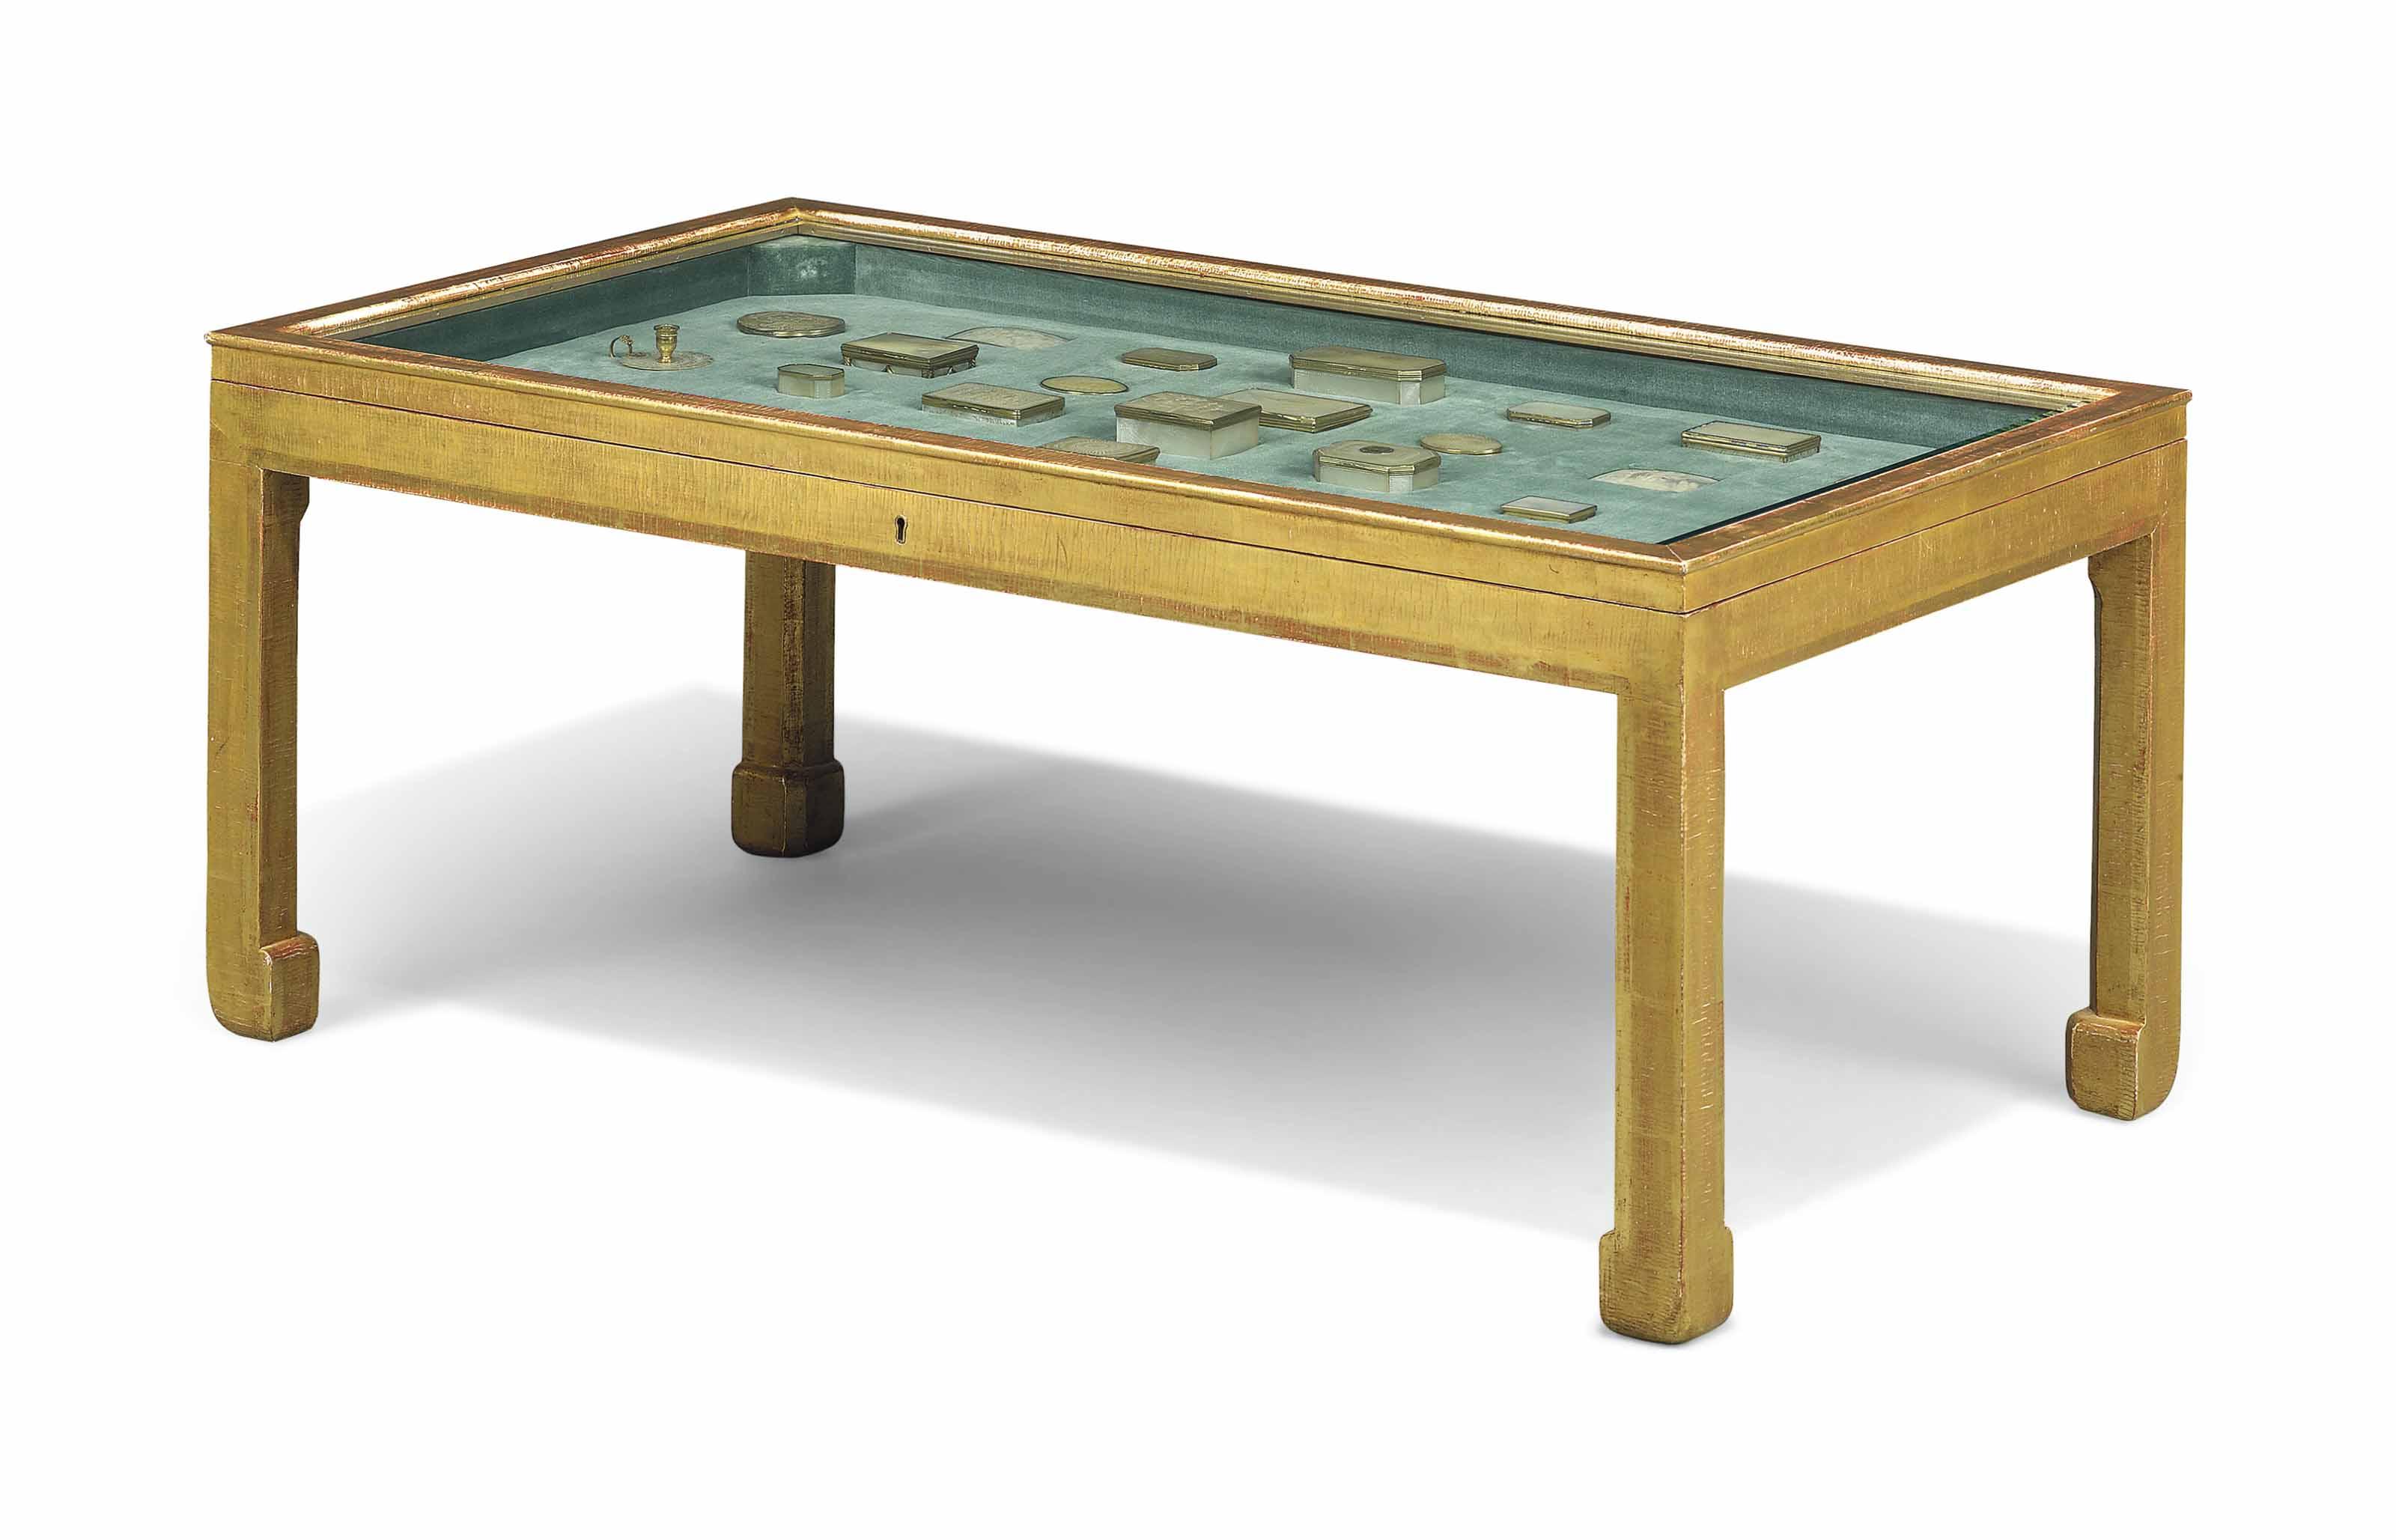 A GILTWOOD DISPLAY TABLE